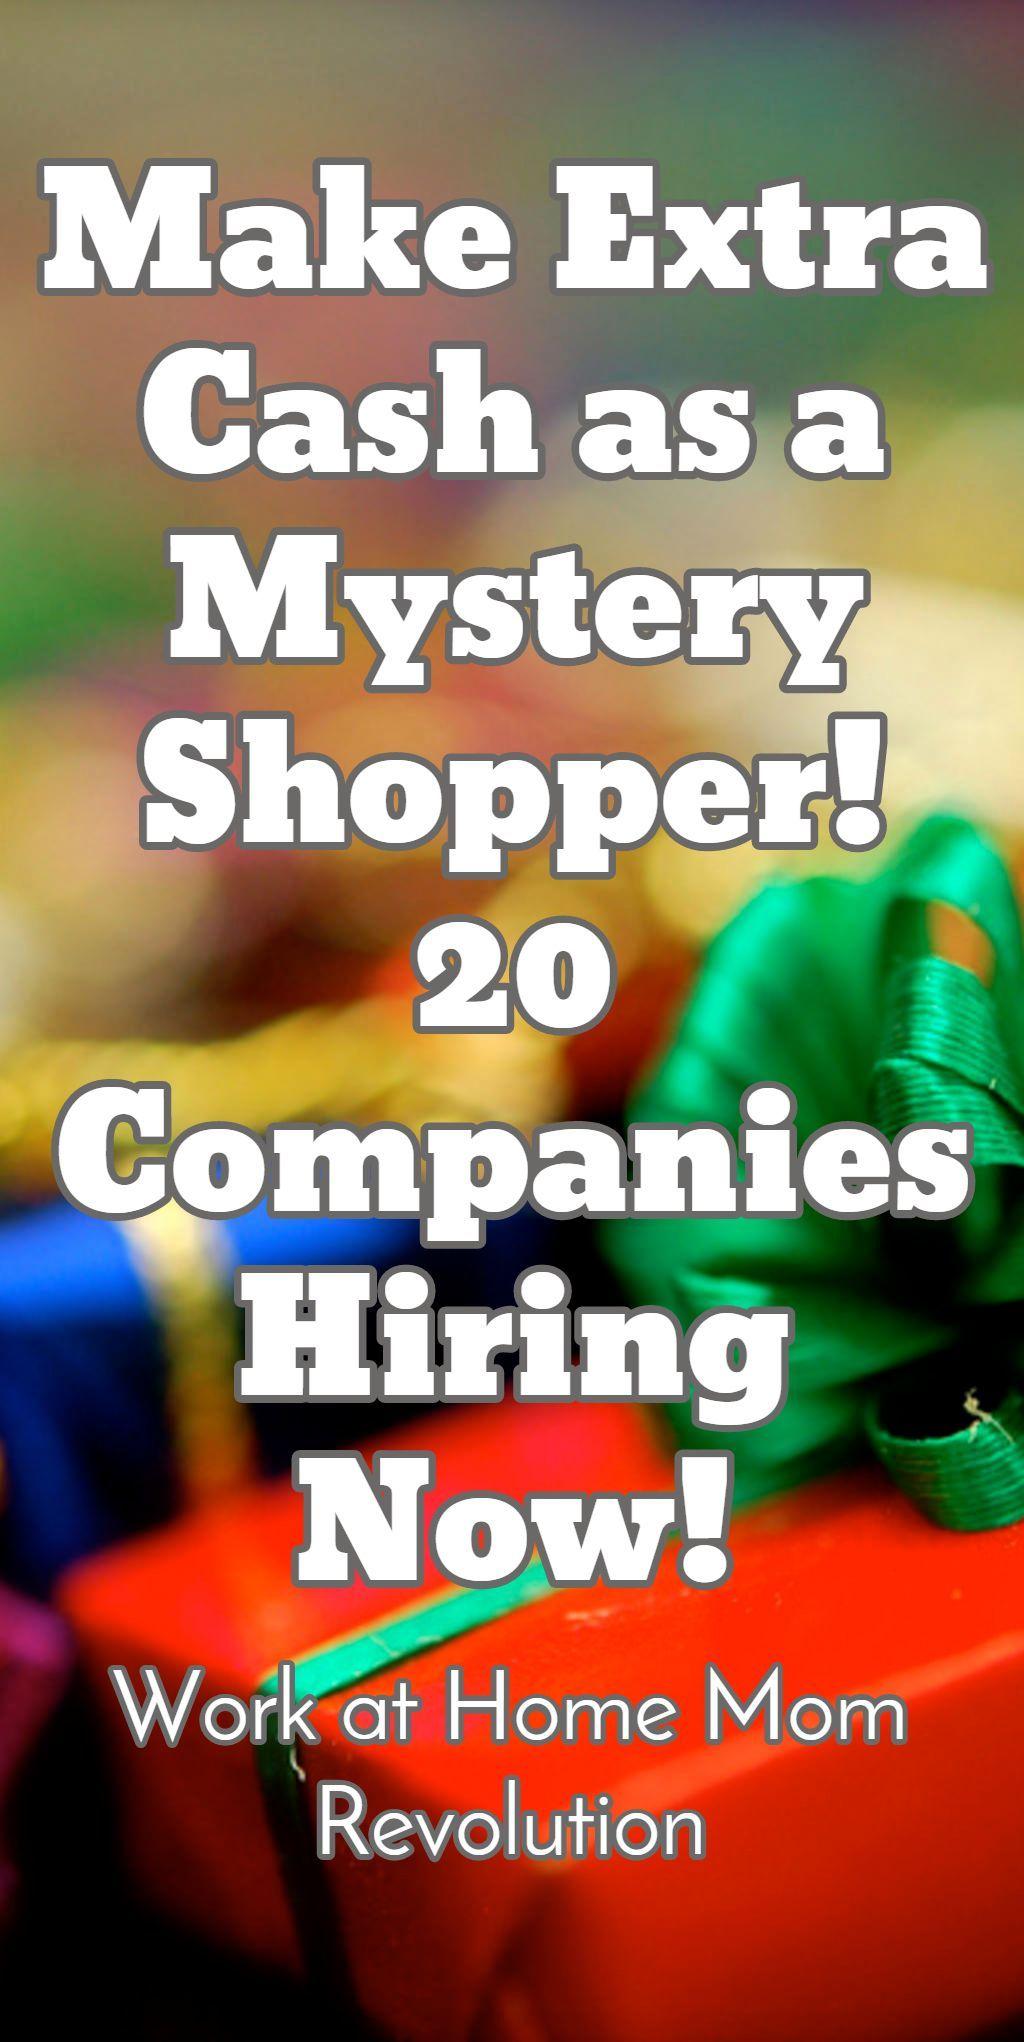 Make Extra Cash as a Mystery Shopper! 20 Companies Hiring